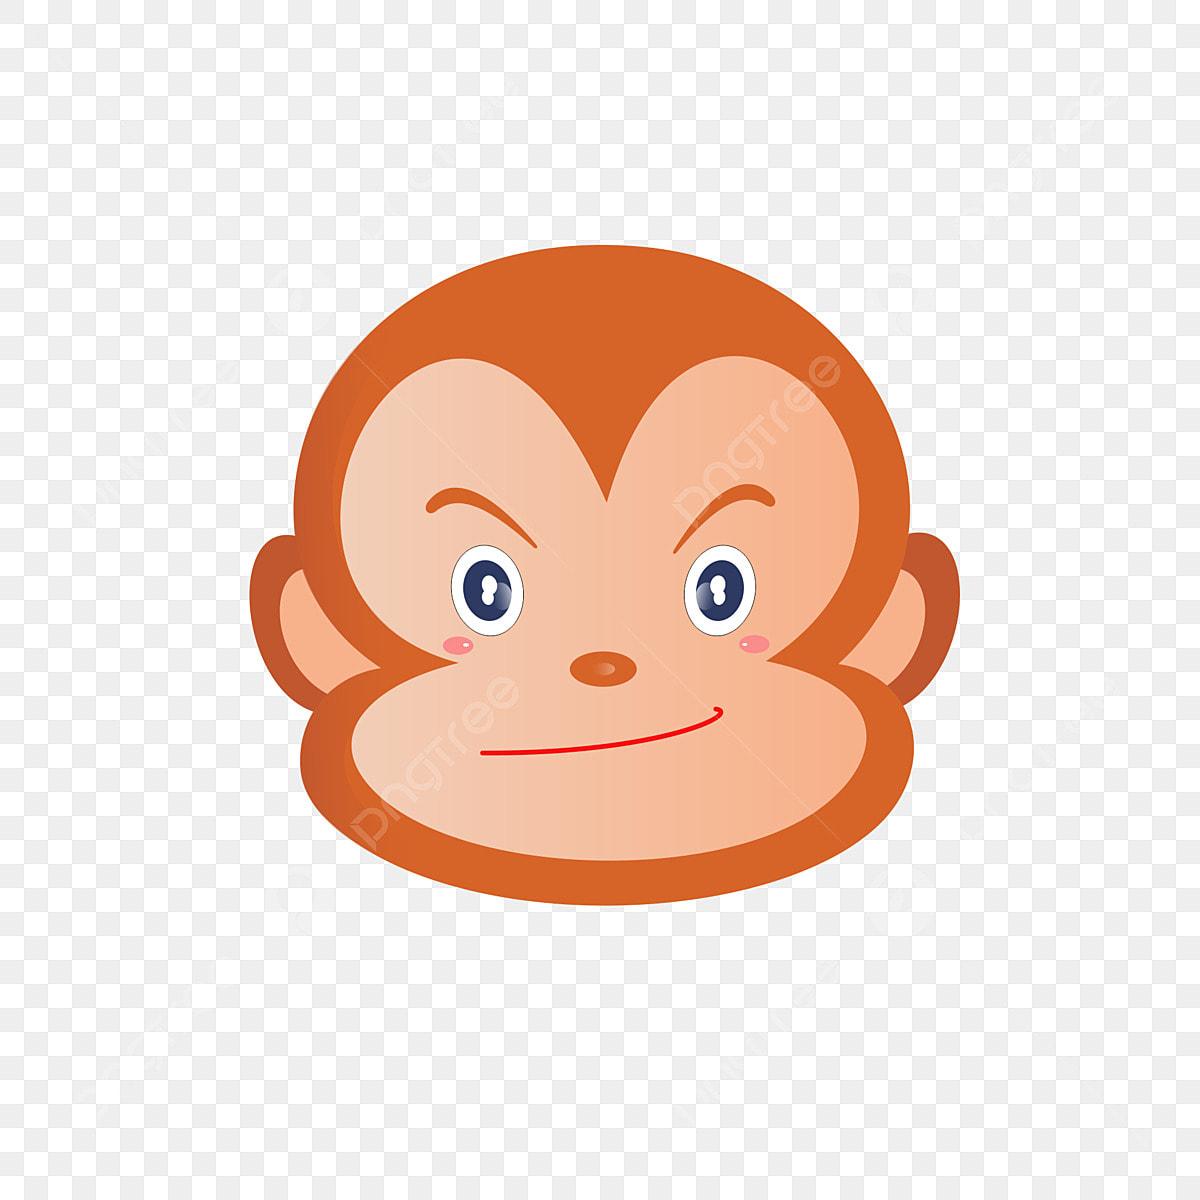 Haiwan Kartun Warna Muka Lucu Monyet Tunggal Fail PNG Dan